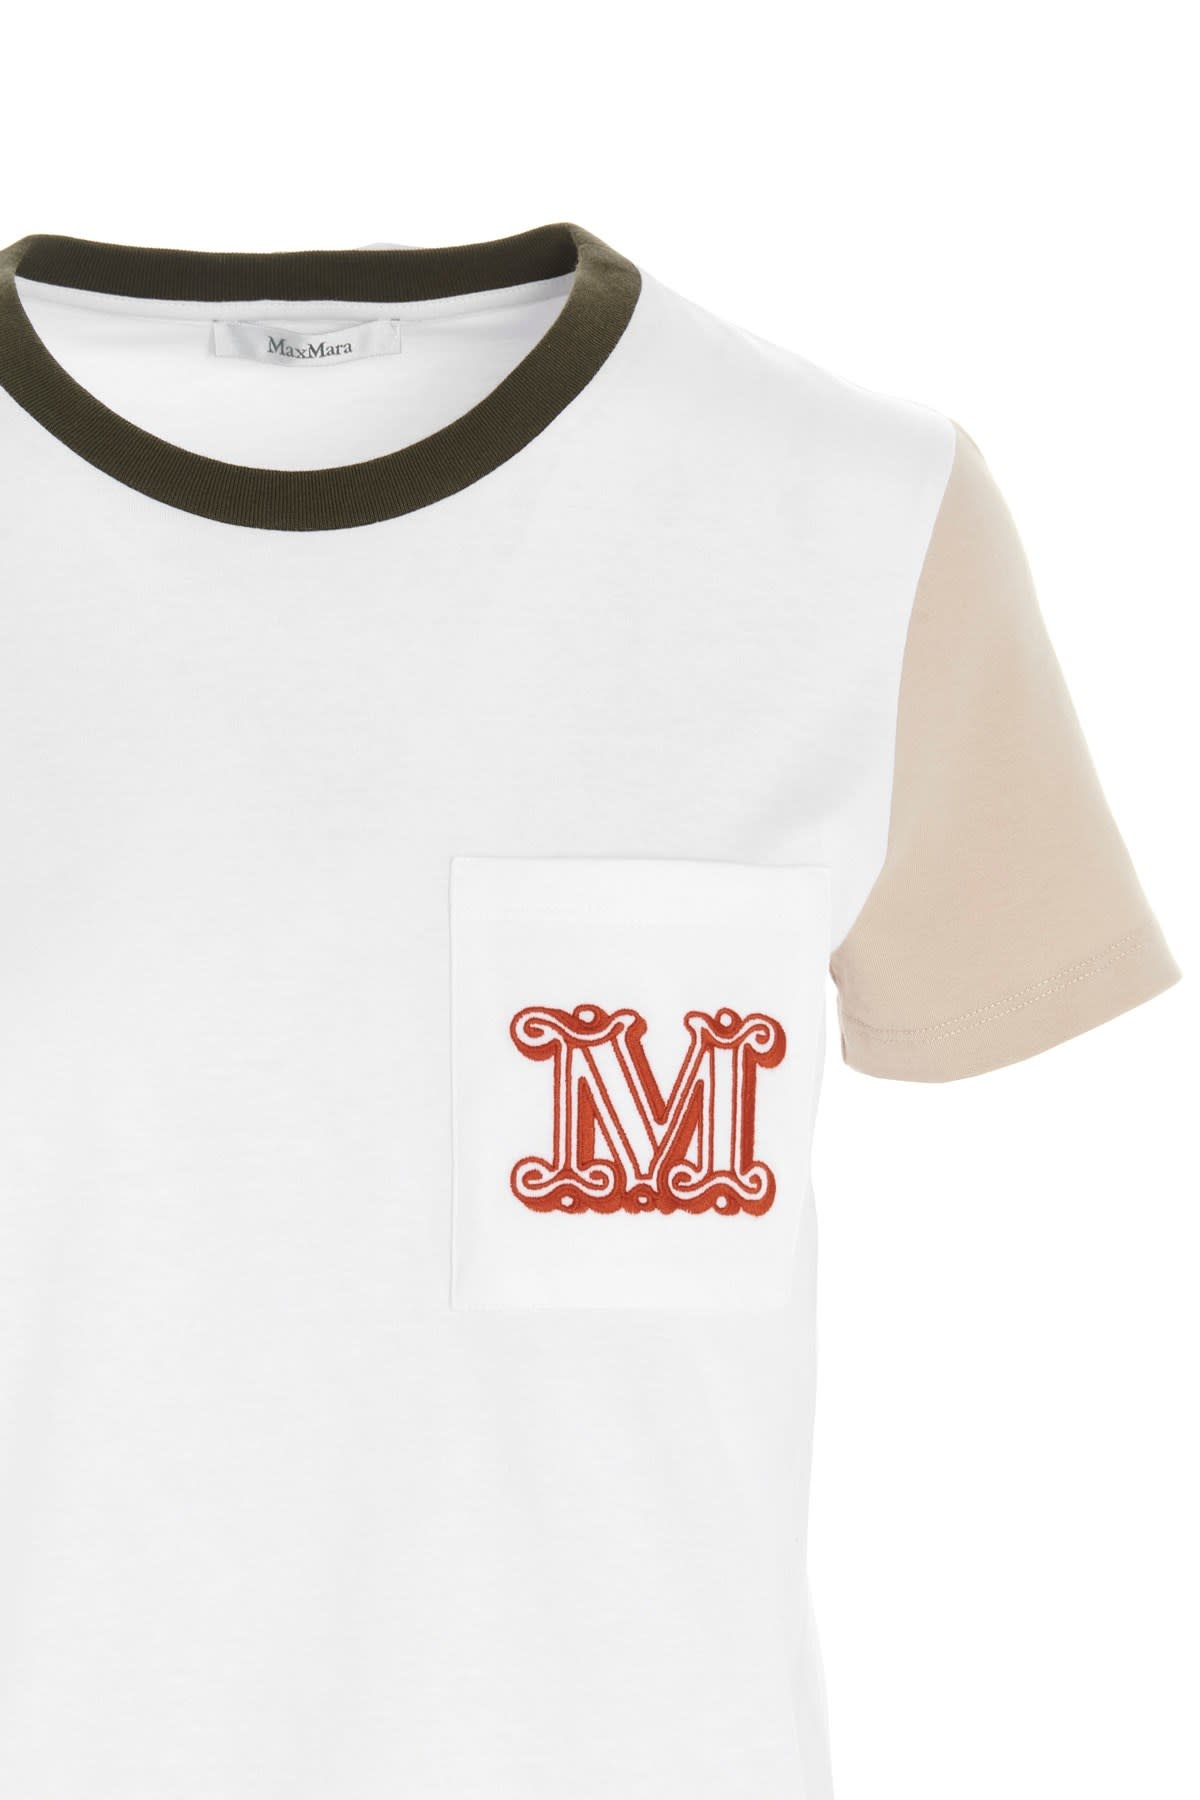 Diego T-shirt MaxMara-1